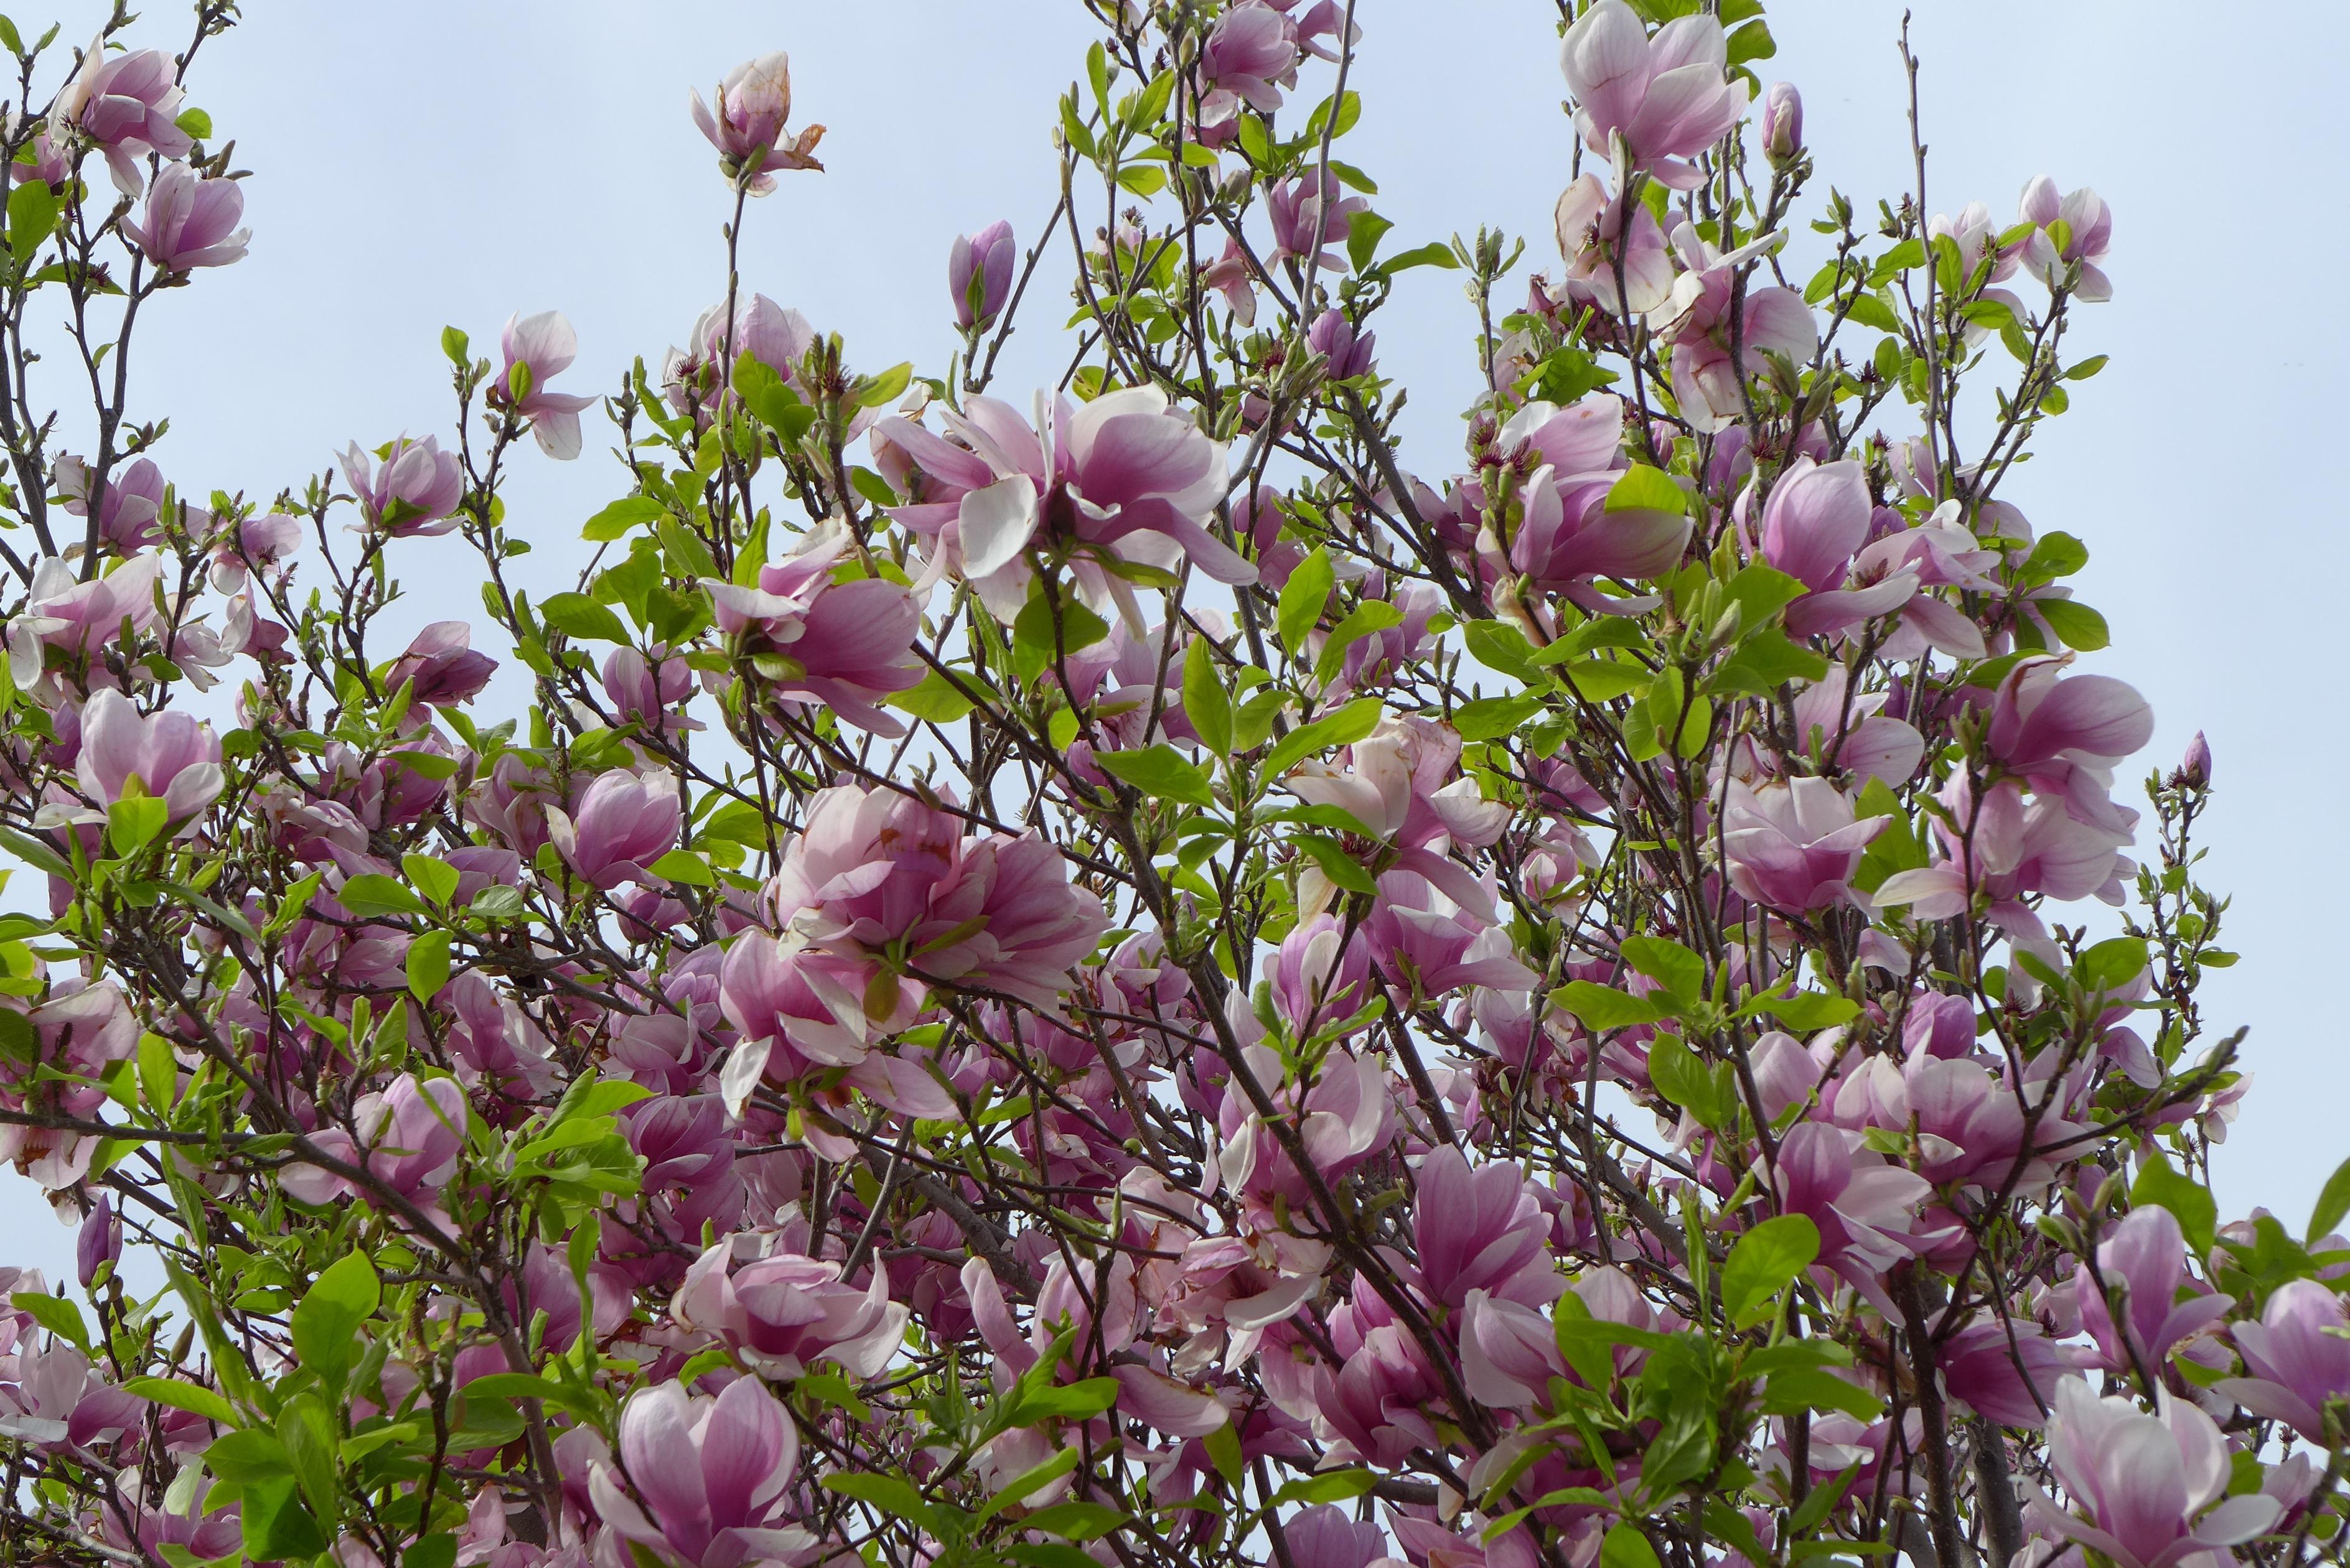 Tree With Large Purple Flowers Free Image